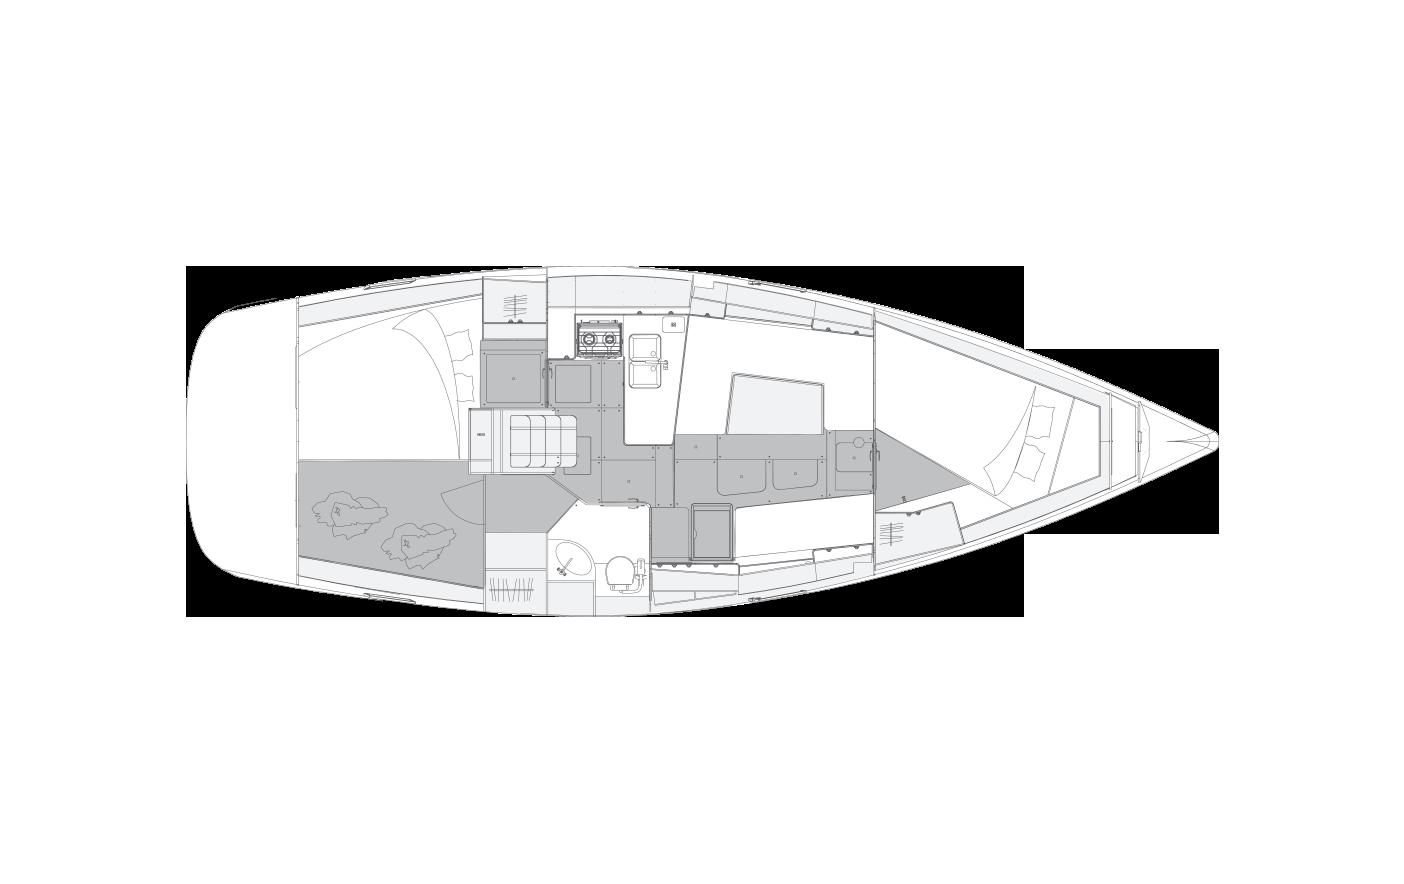 i40.1 - 2 cabins & 1 head